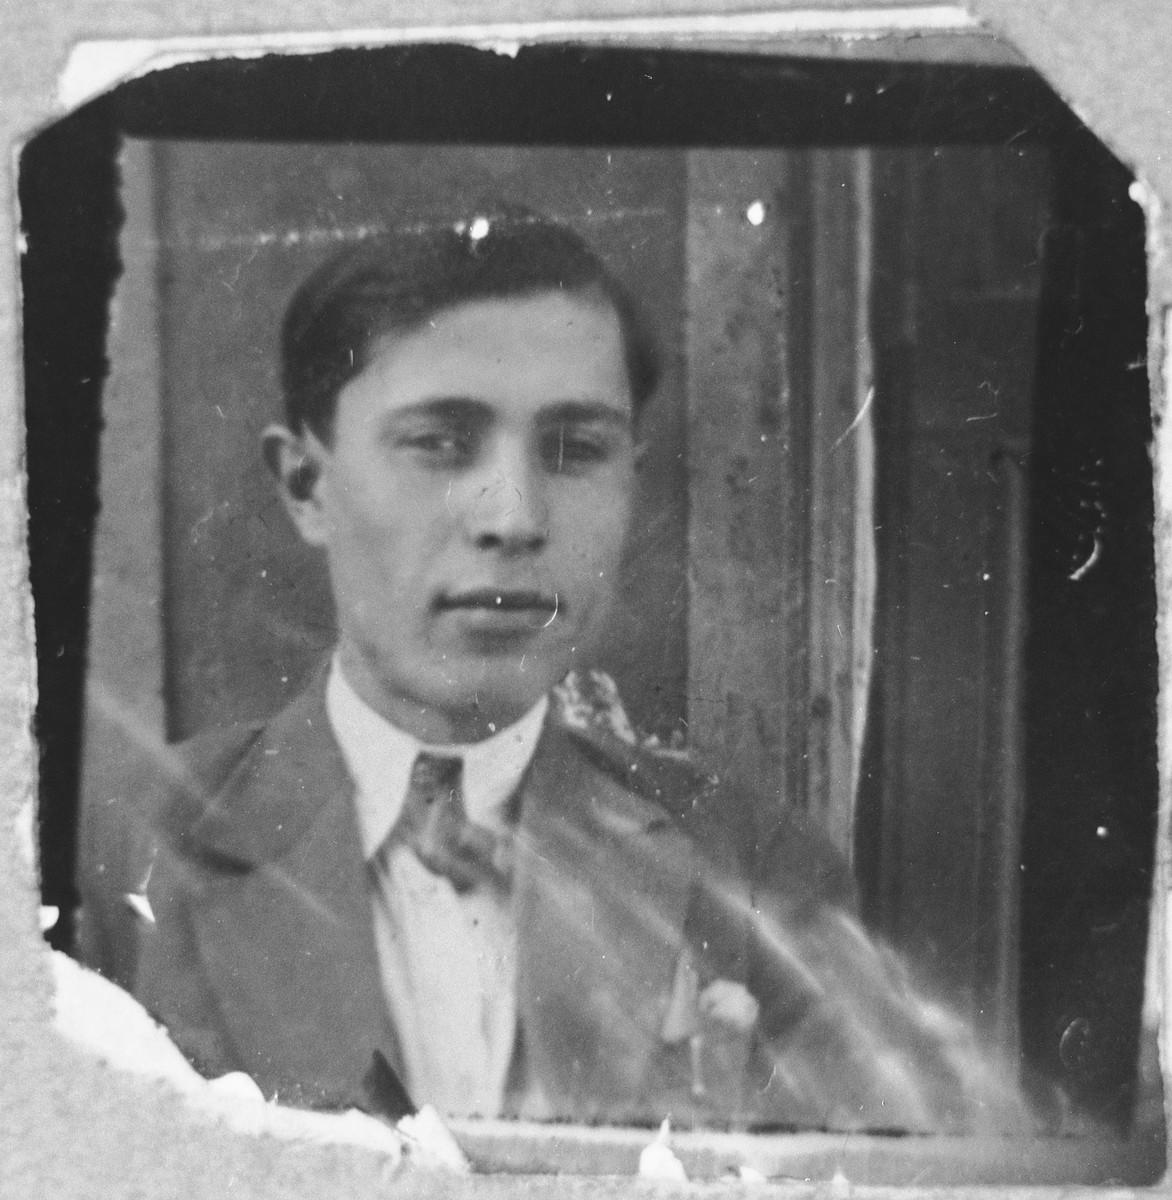 Portrait of Avram Hasson, son of Isak Hasson.